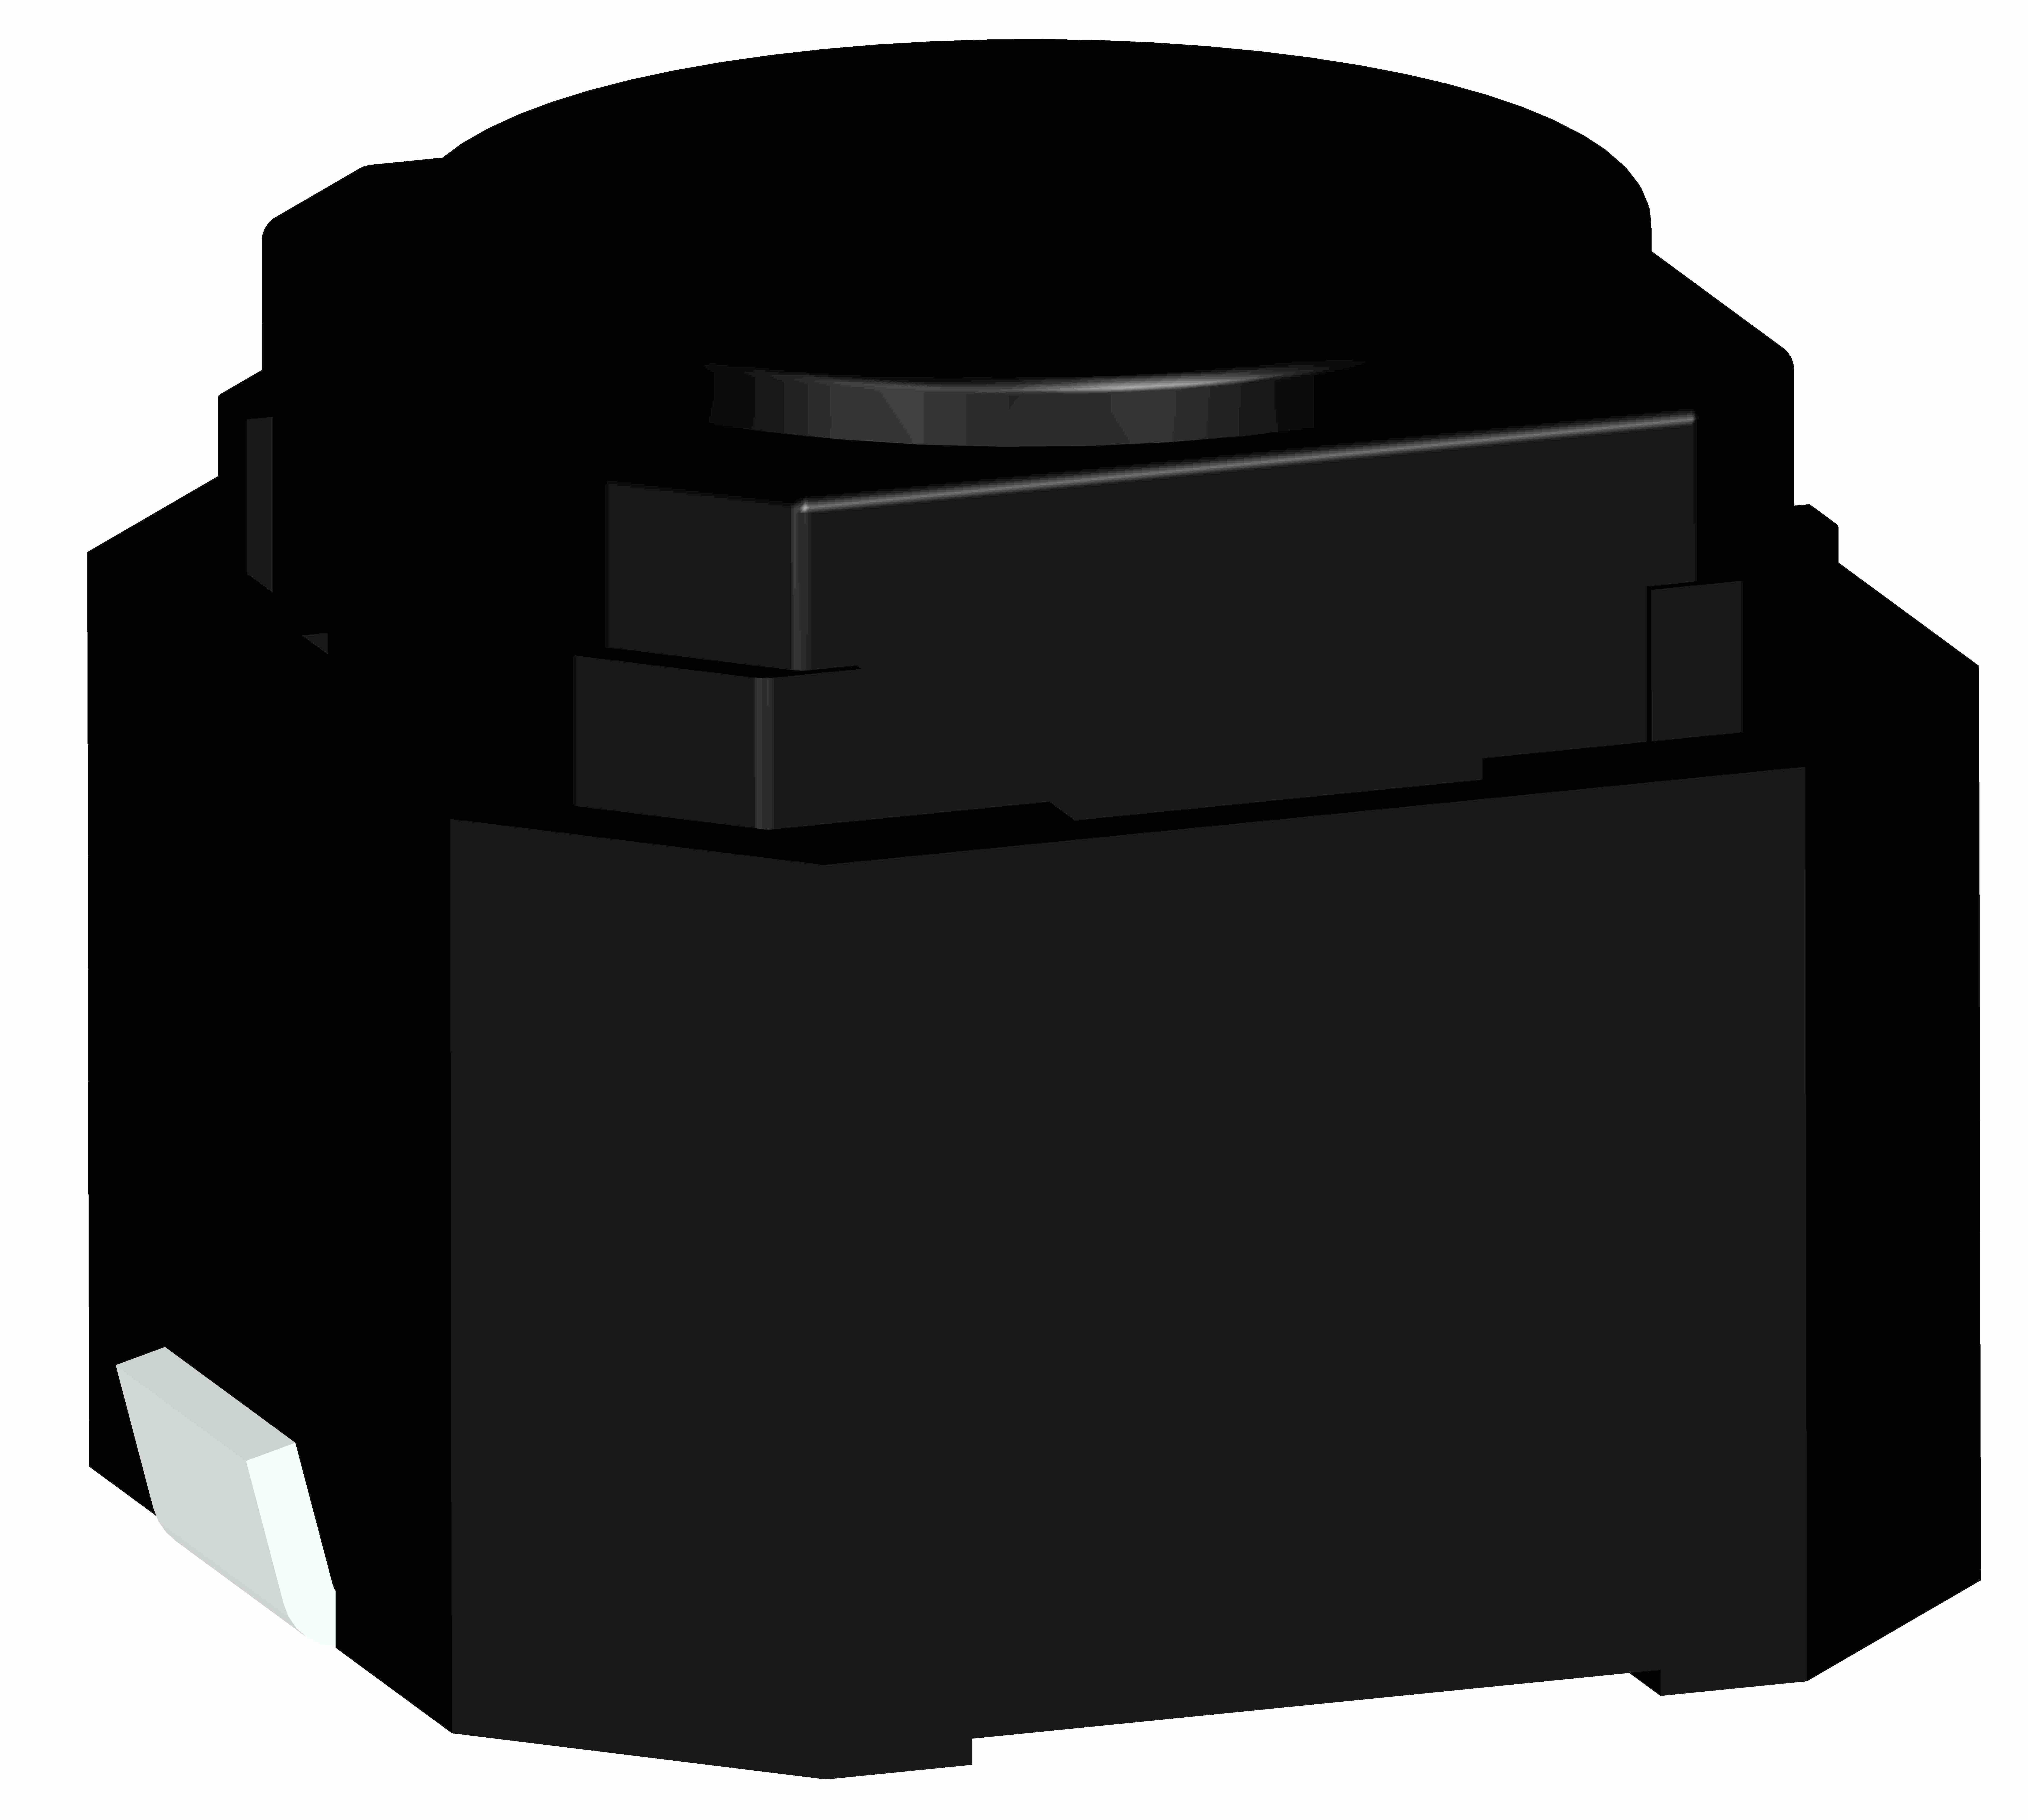 SMART Power Adjustable Tool Cabinet / CSPS CO., LTD.